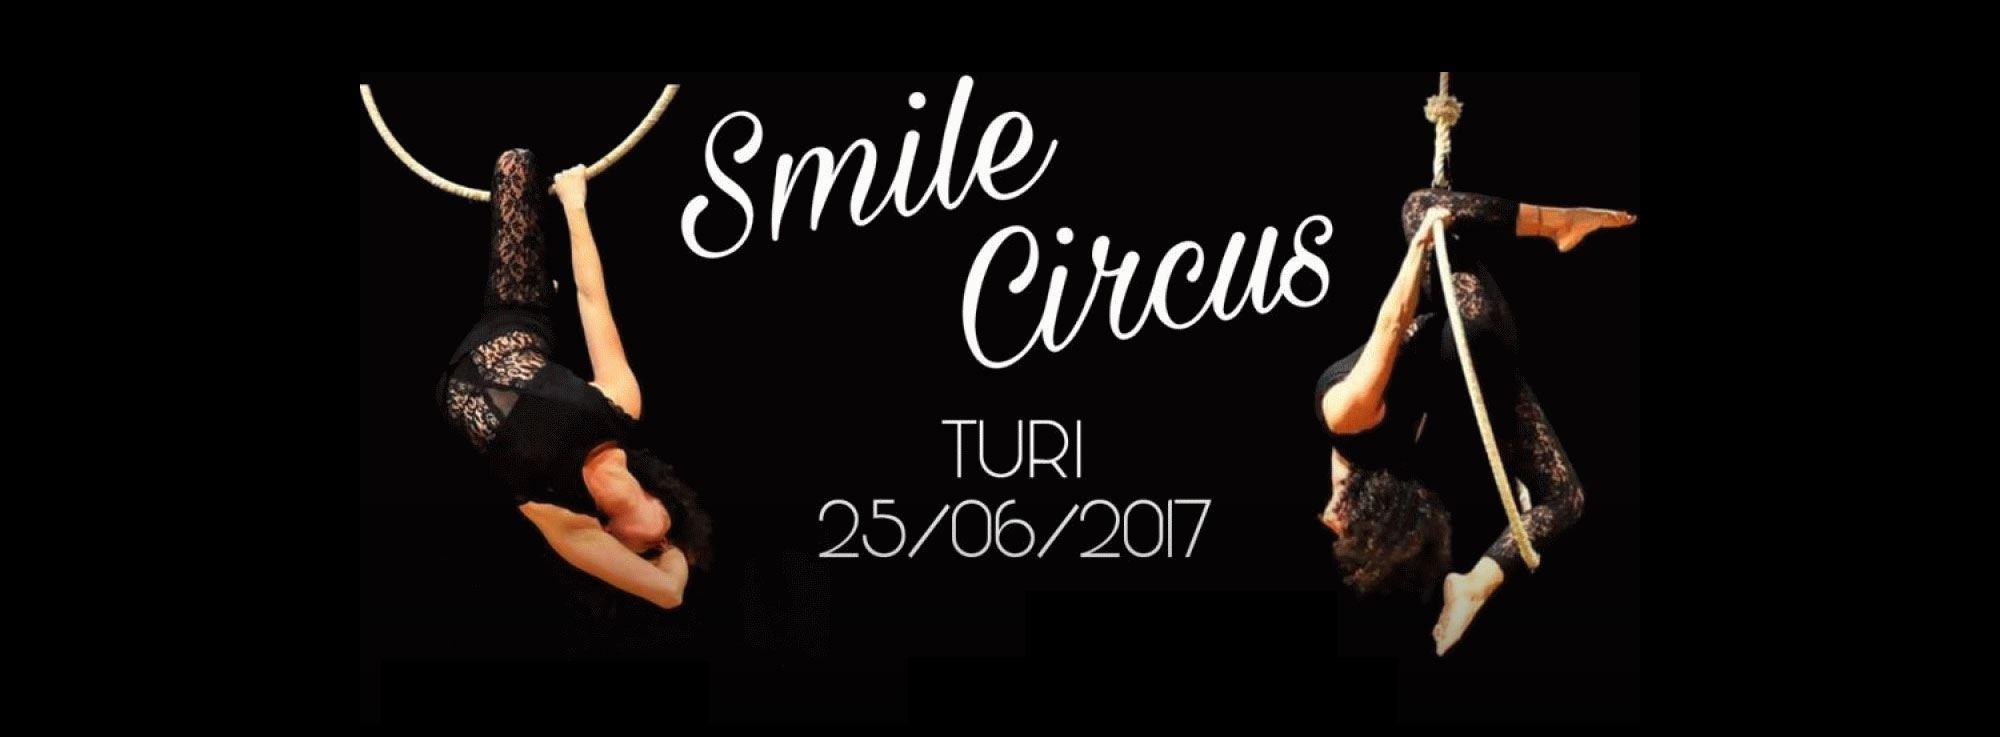 Turi: Smile Circus